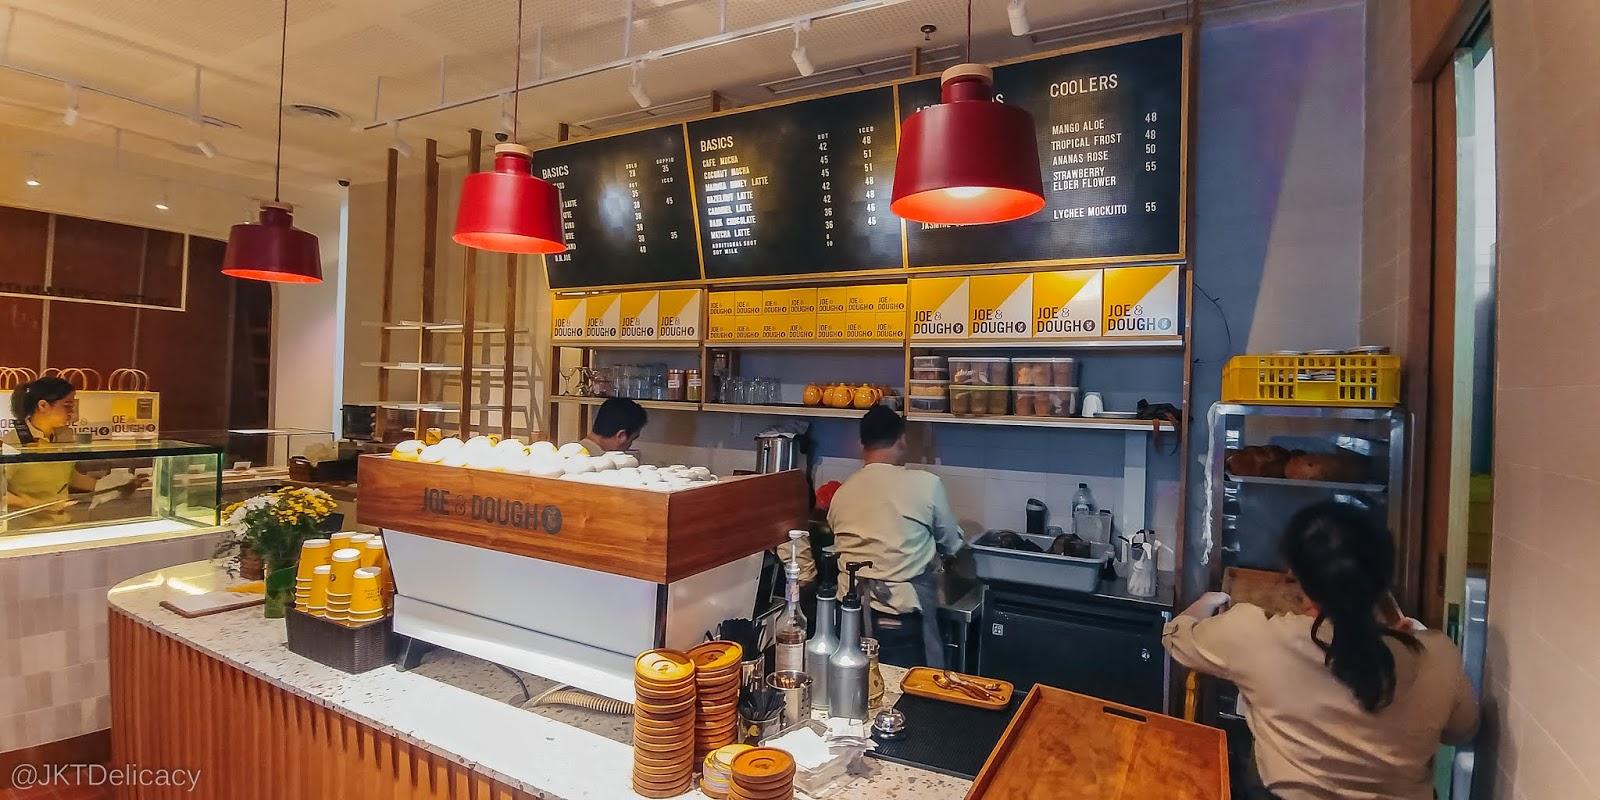 Jktdelicacycom Joe Dough Coffee Shop X Bakery From Singapore